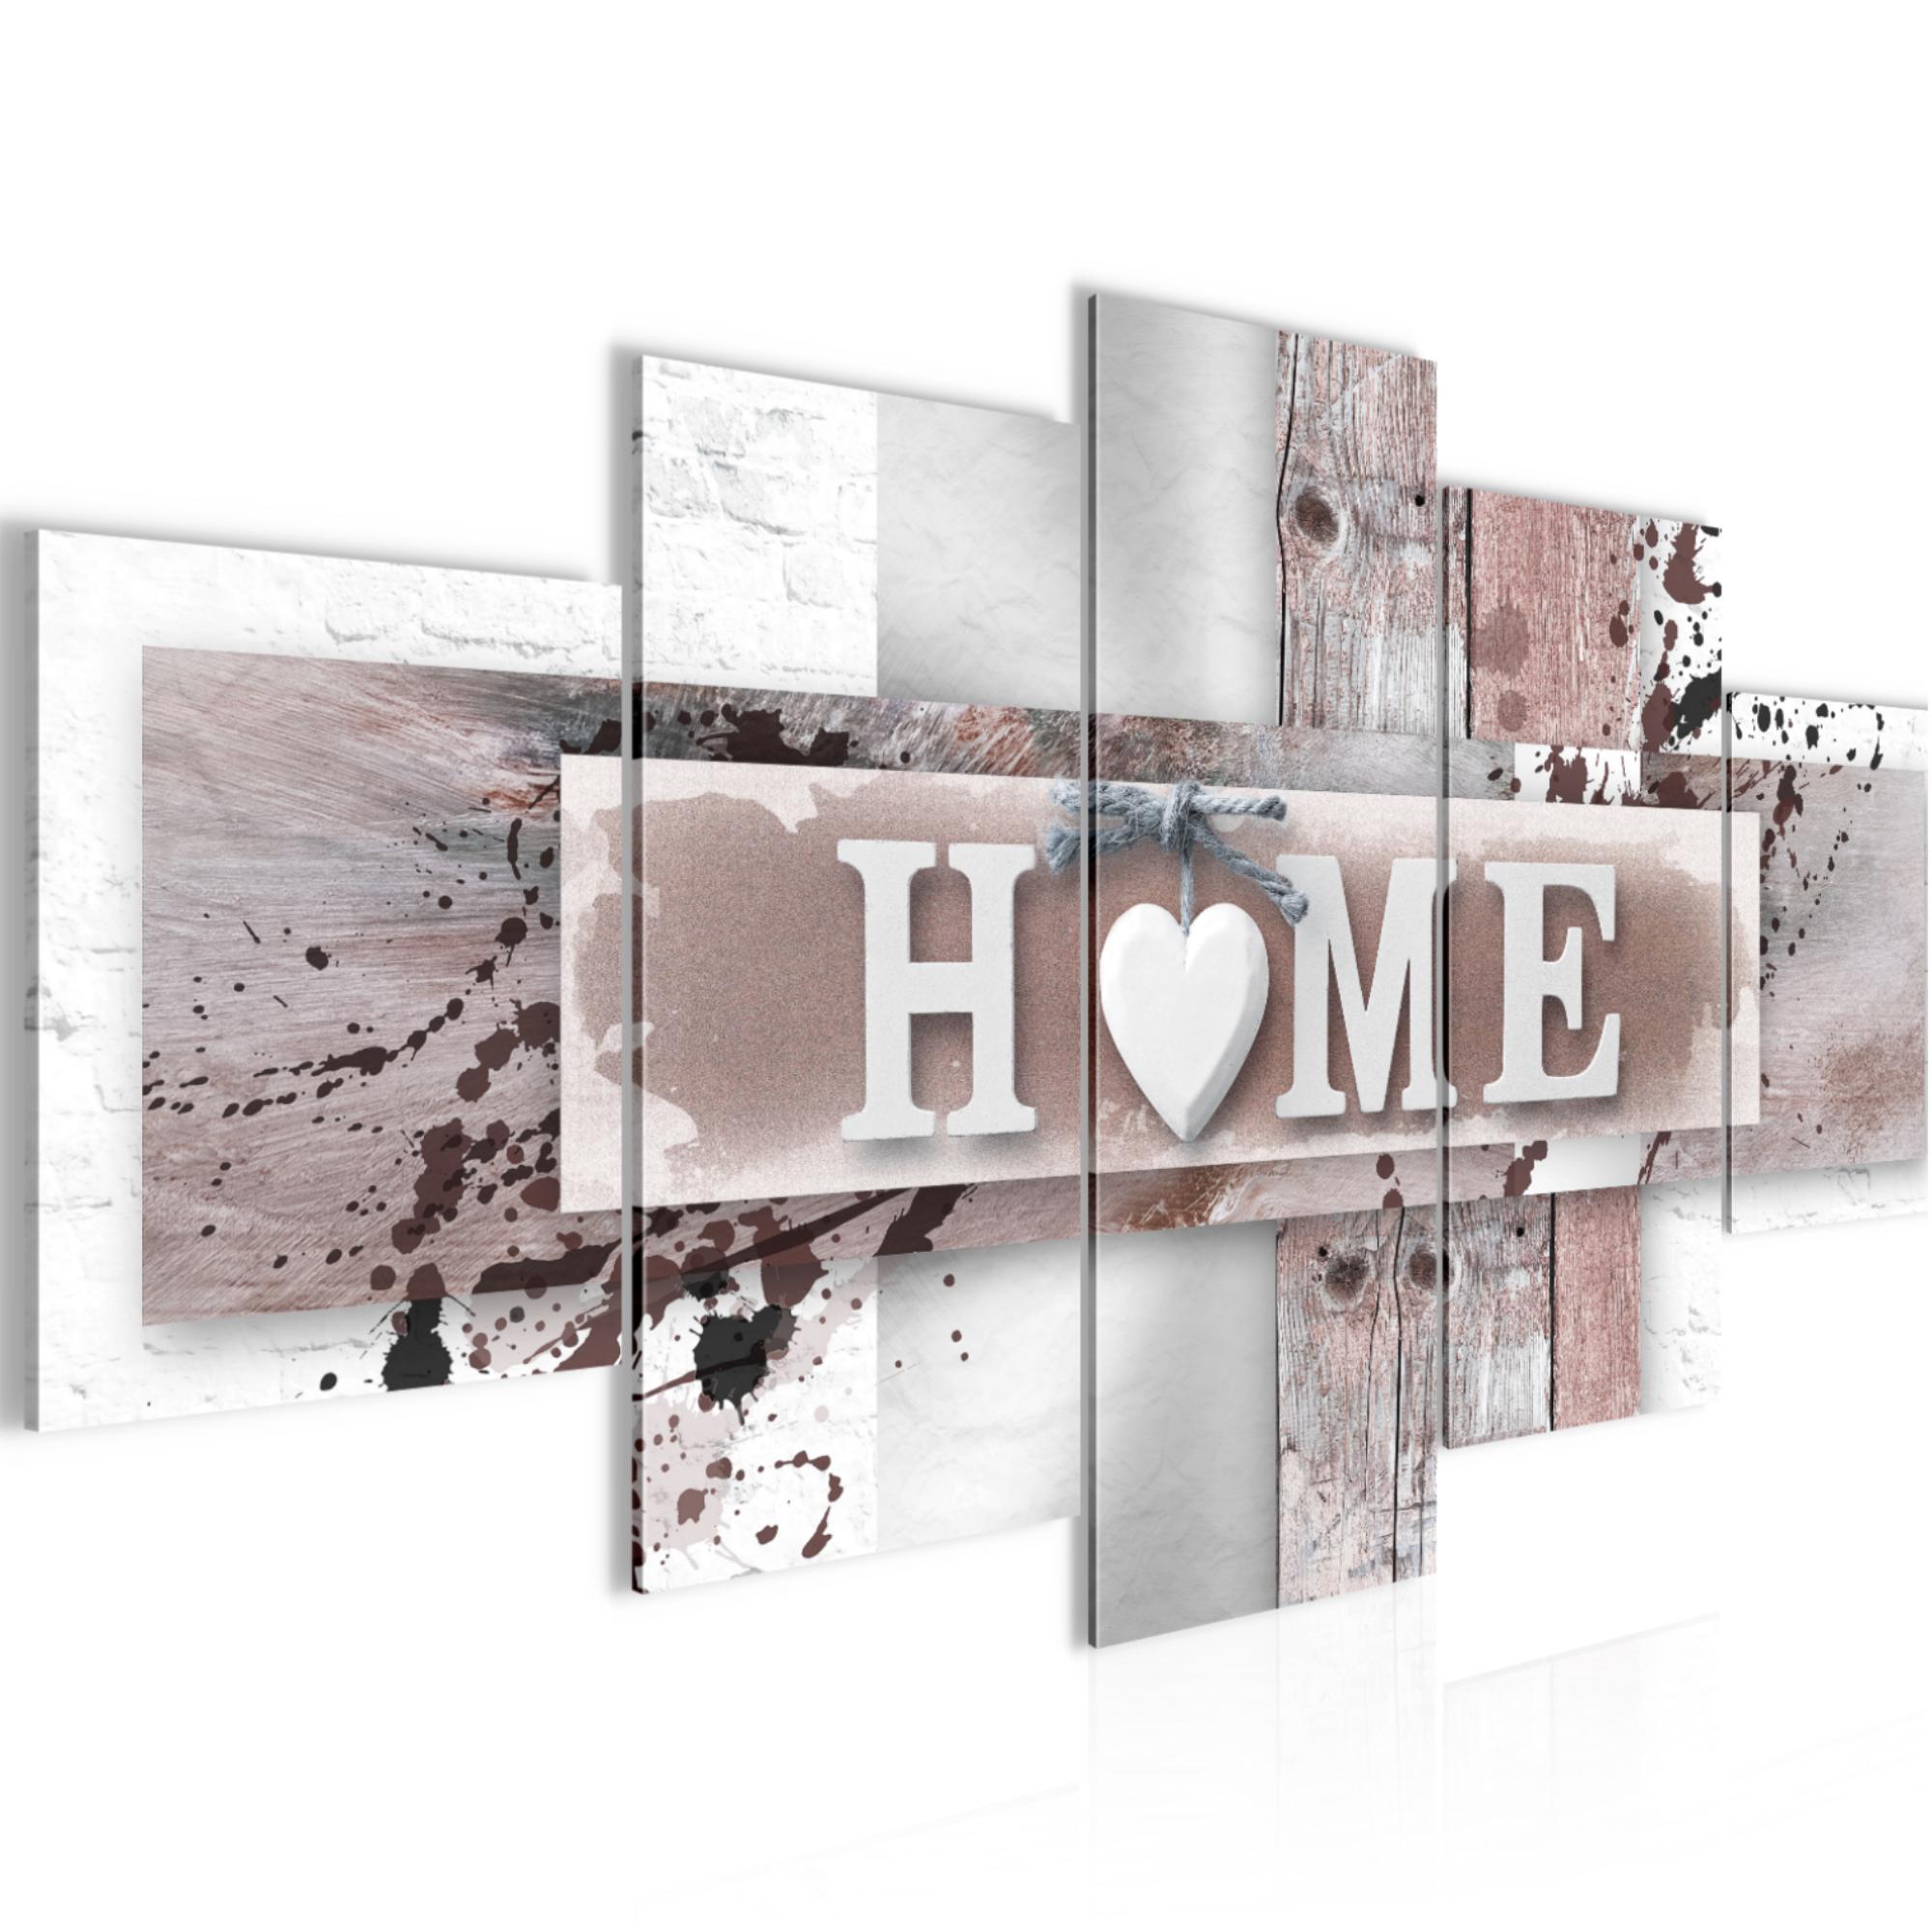 Bild Bilder Wandbild XXL  Home  Kunstdruck Leinwand aus Vlies  Wanddeko Chic  eBay